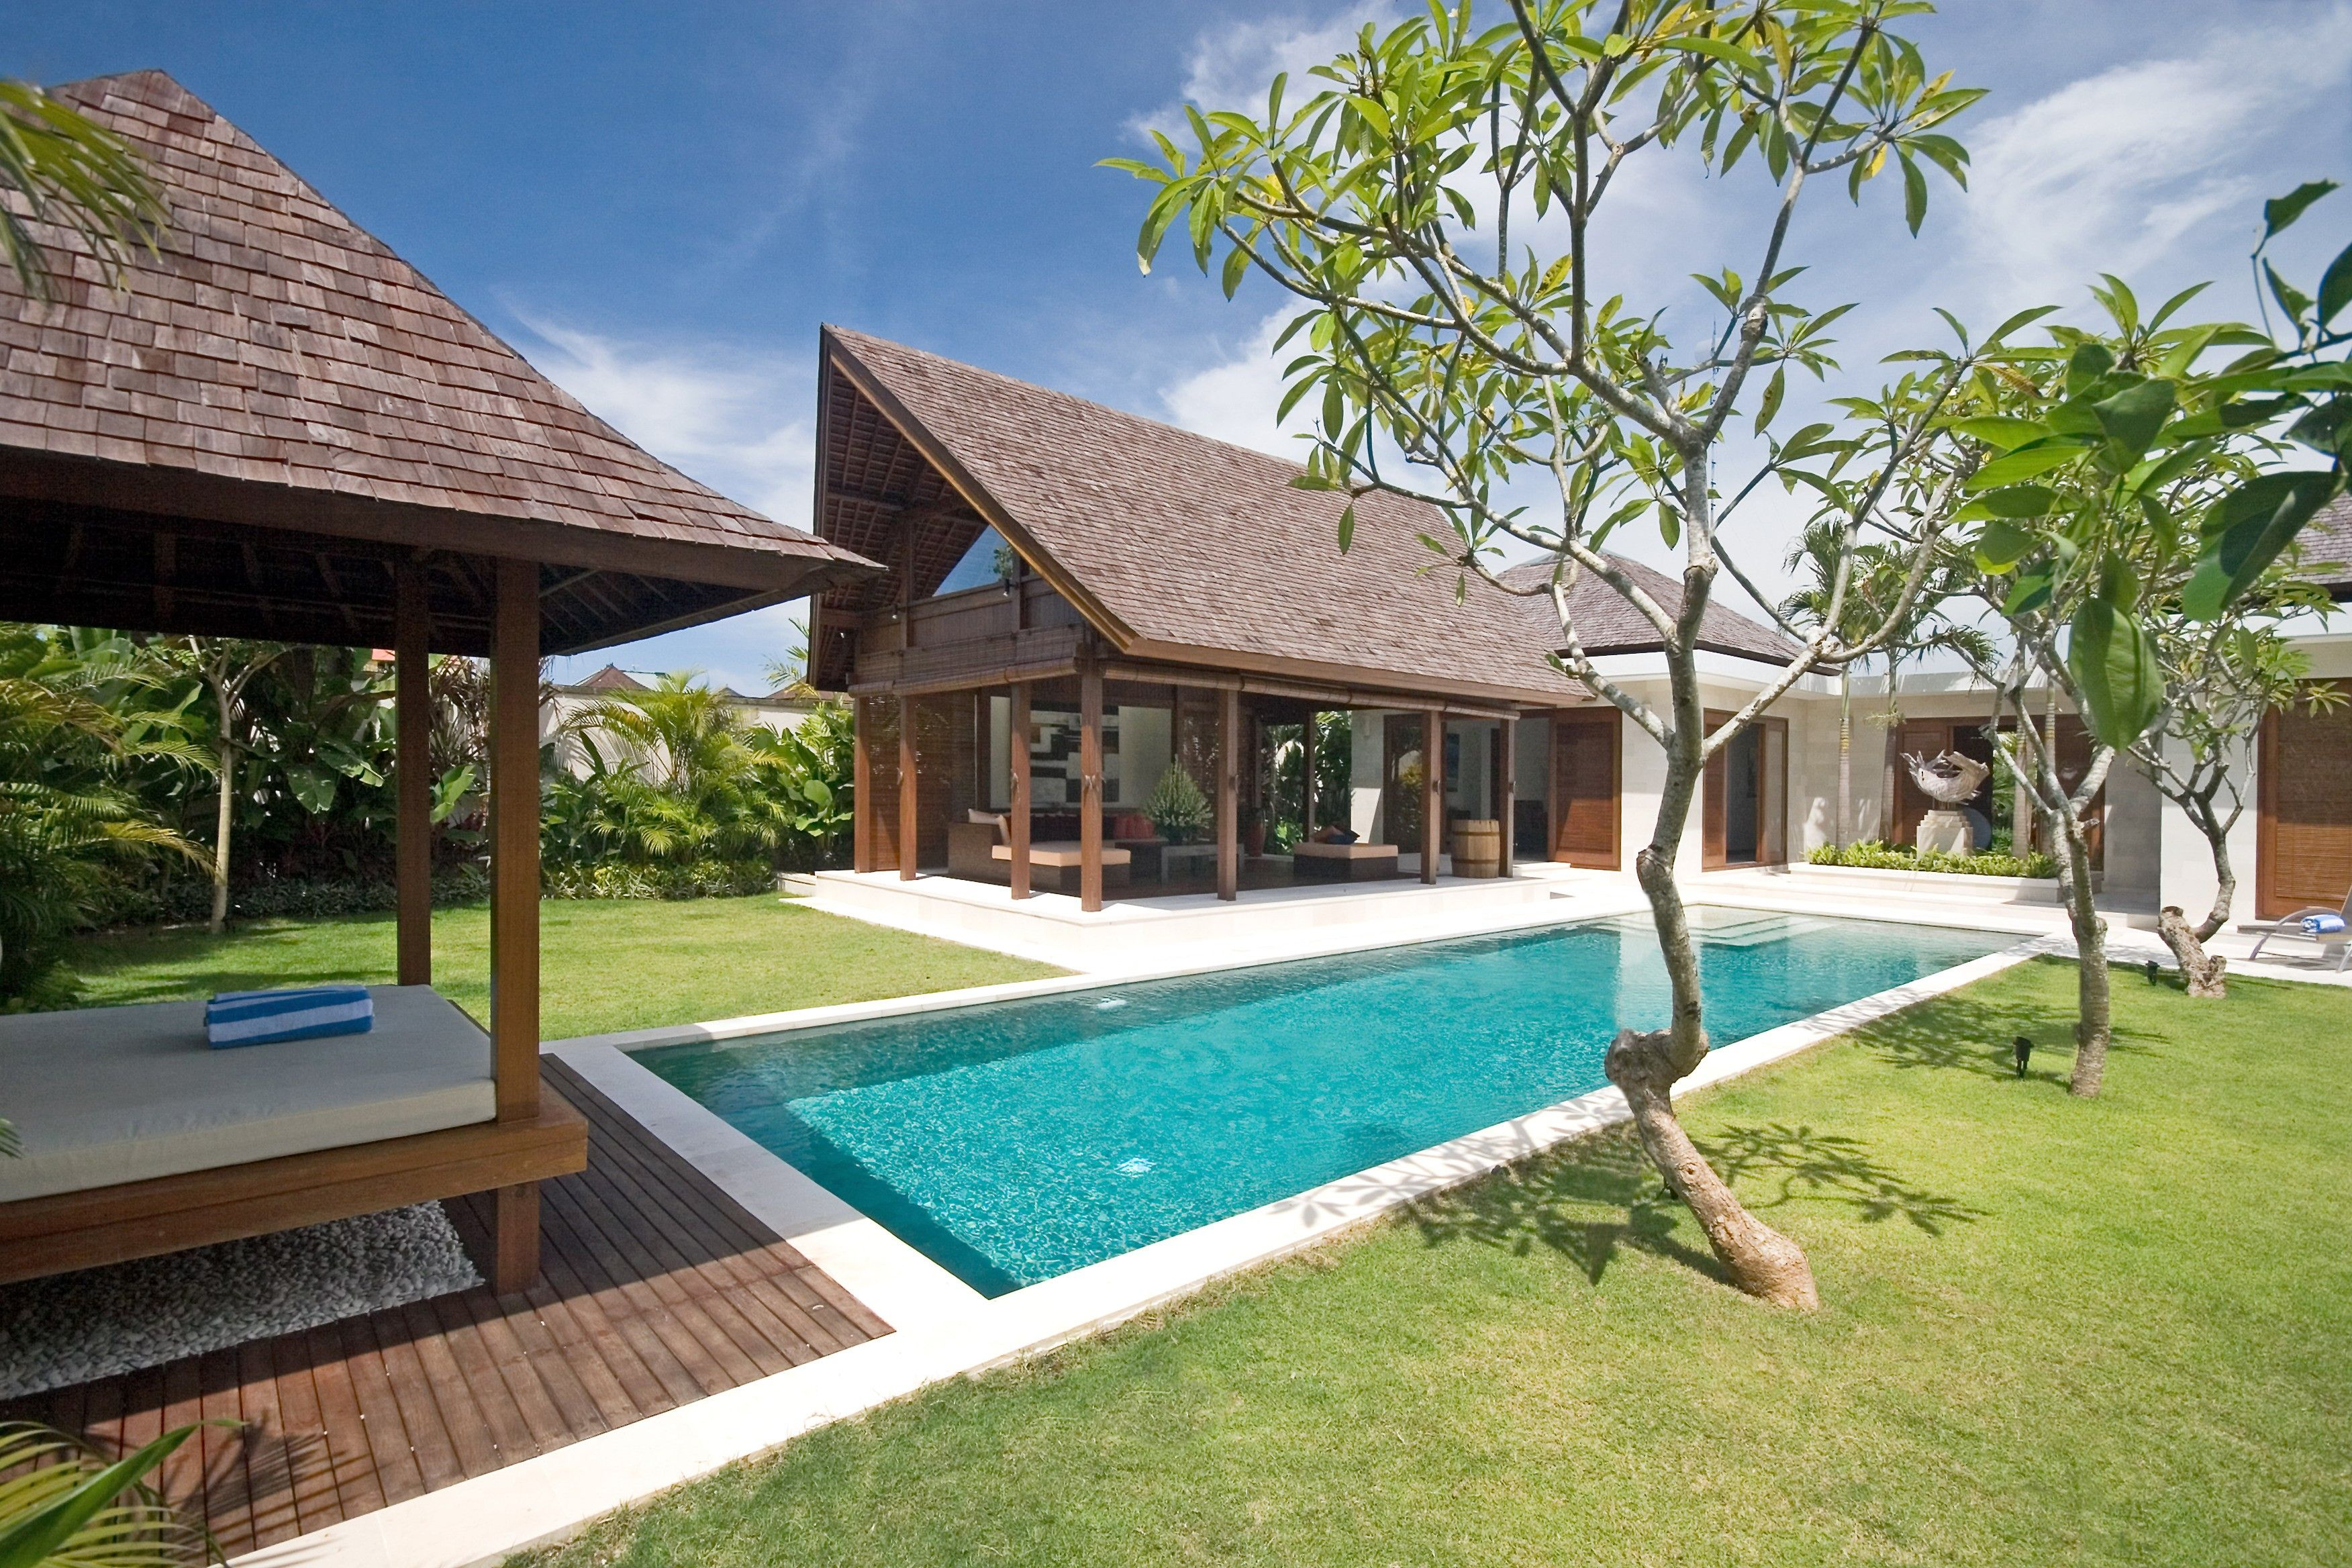 villa rental for four in bali ask the owner direct villa rh pinterest com